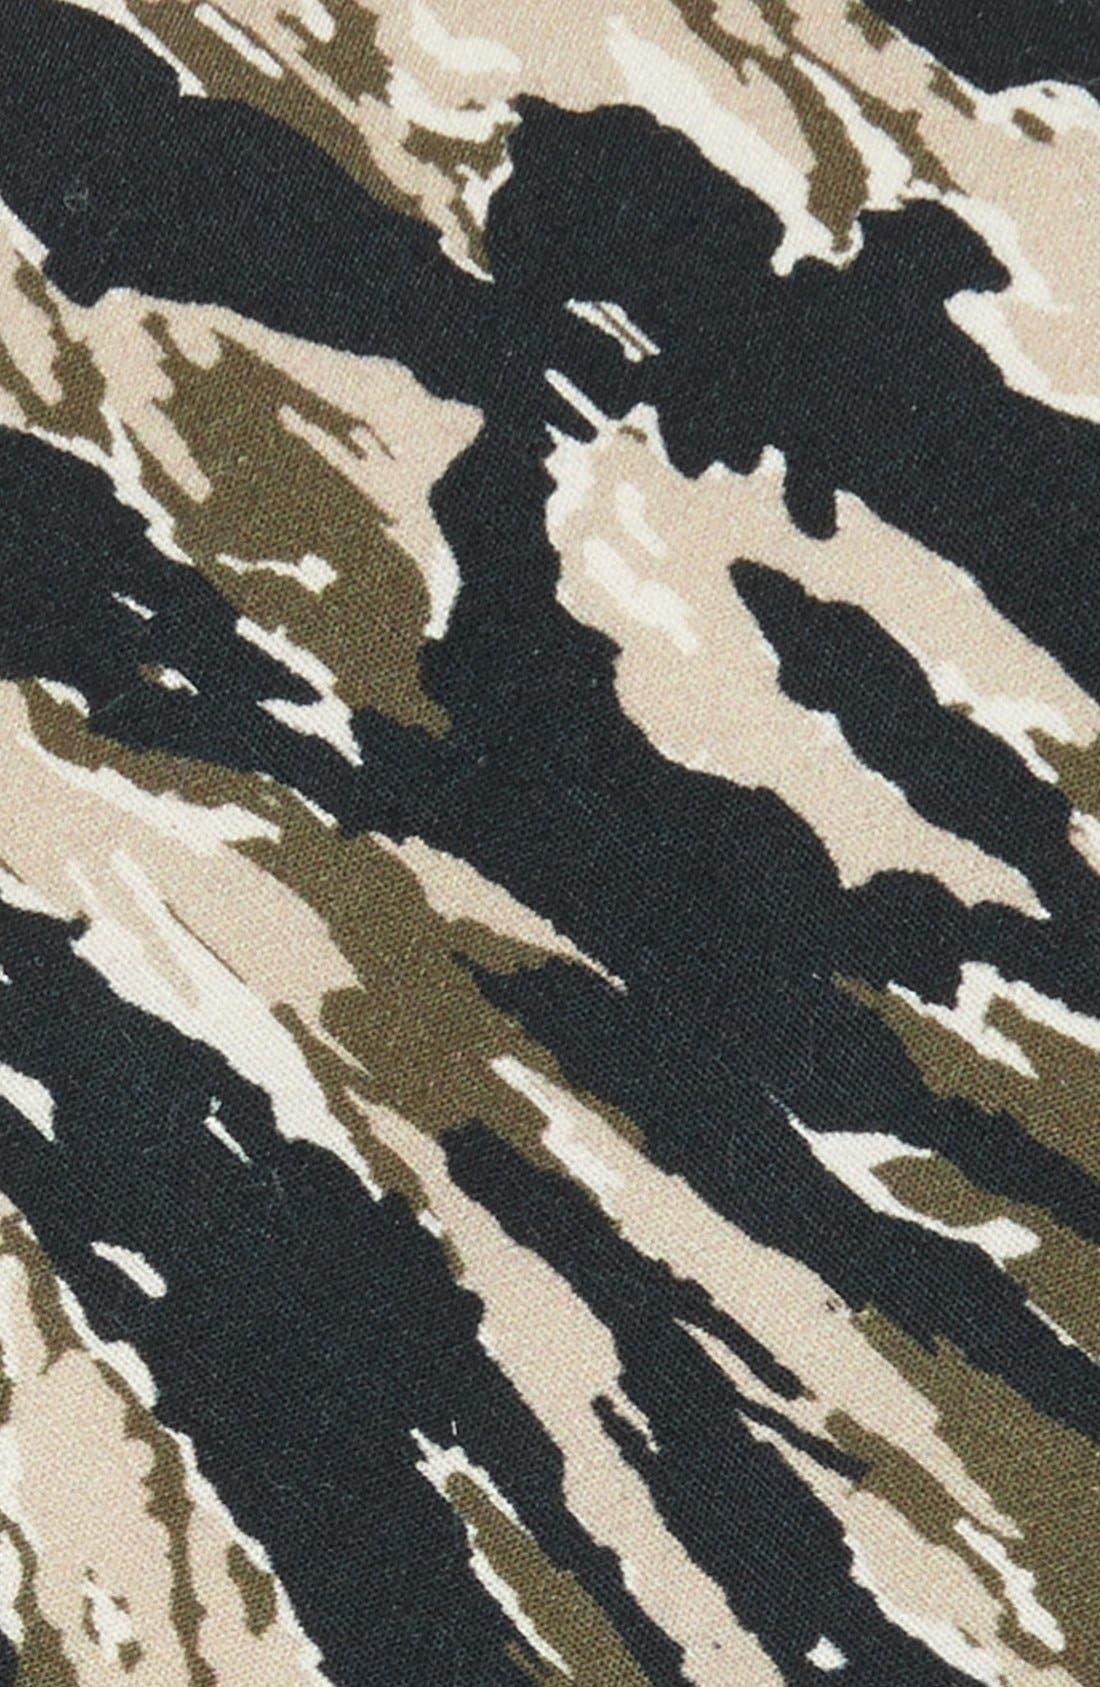 Alternate Image 2  - EDIT by The Tie Bar Camo Cotton Tie (Nordstrom Exclusive)